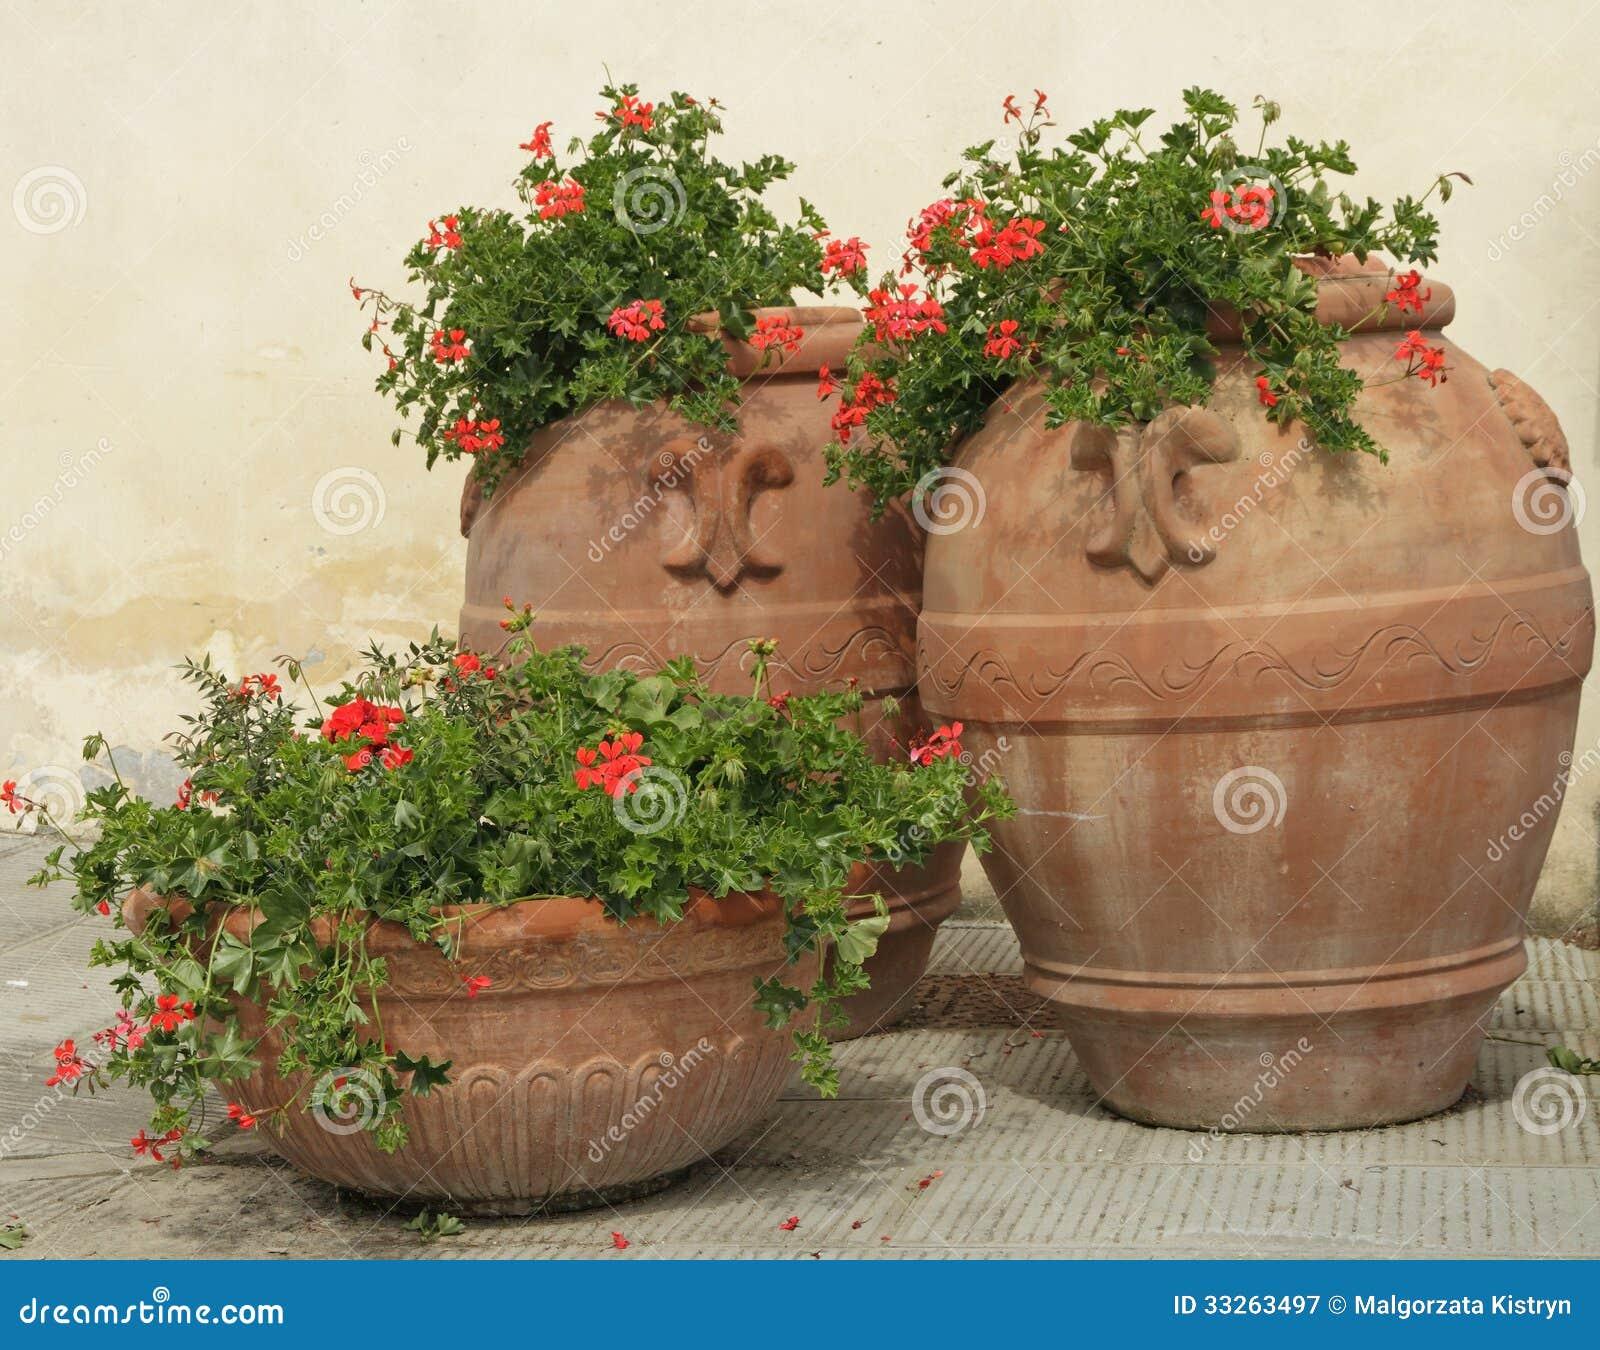 Vasi Da Giardino In Terracotta.Vasi In Terracotta Prezzi Retro Vasi Di Terracotta Con I